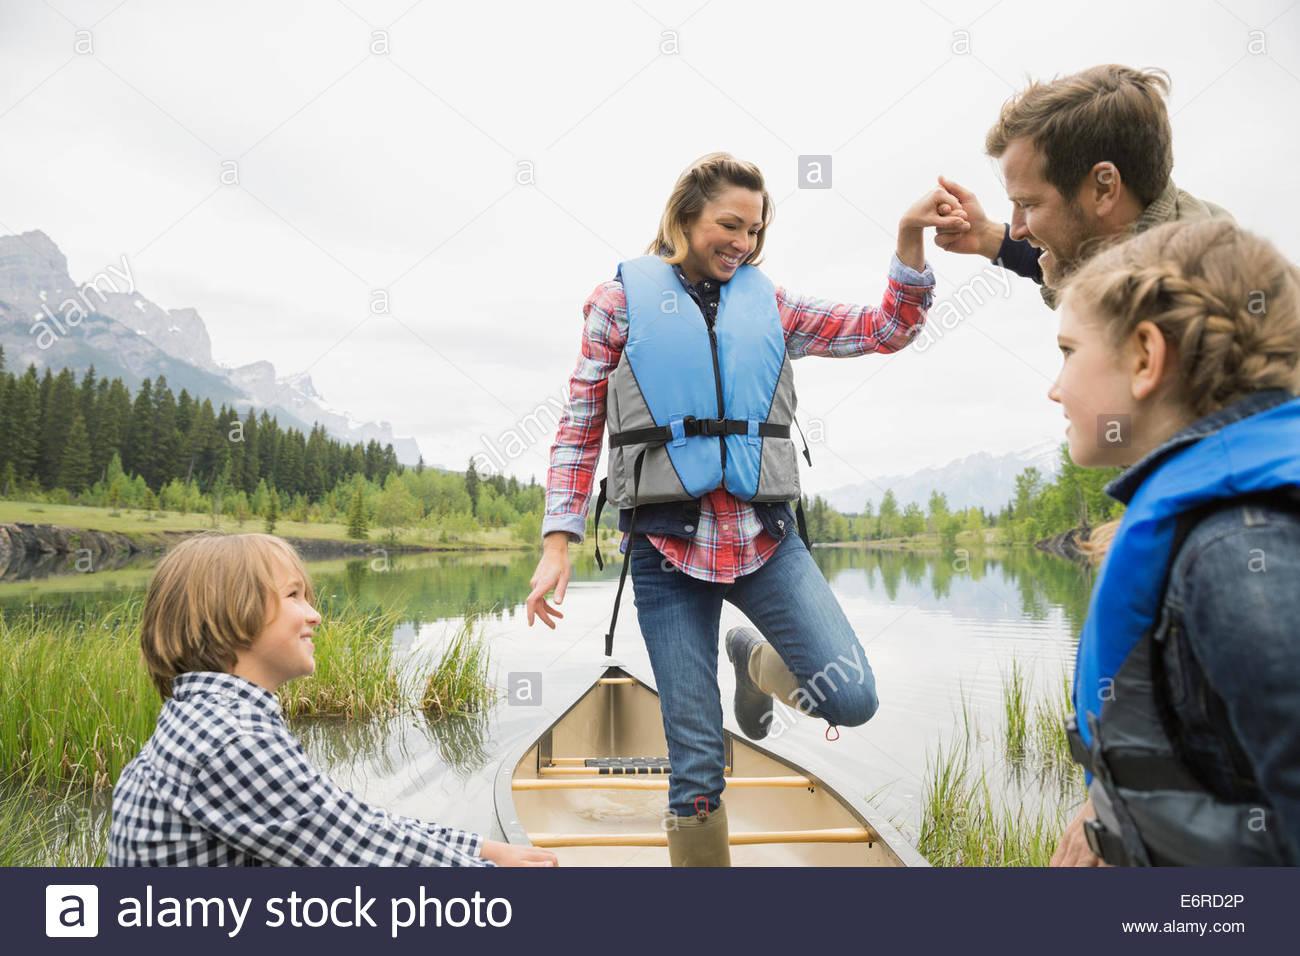 Mann Frau aus Kanu noch See zu helfen Stockbild